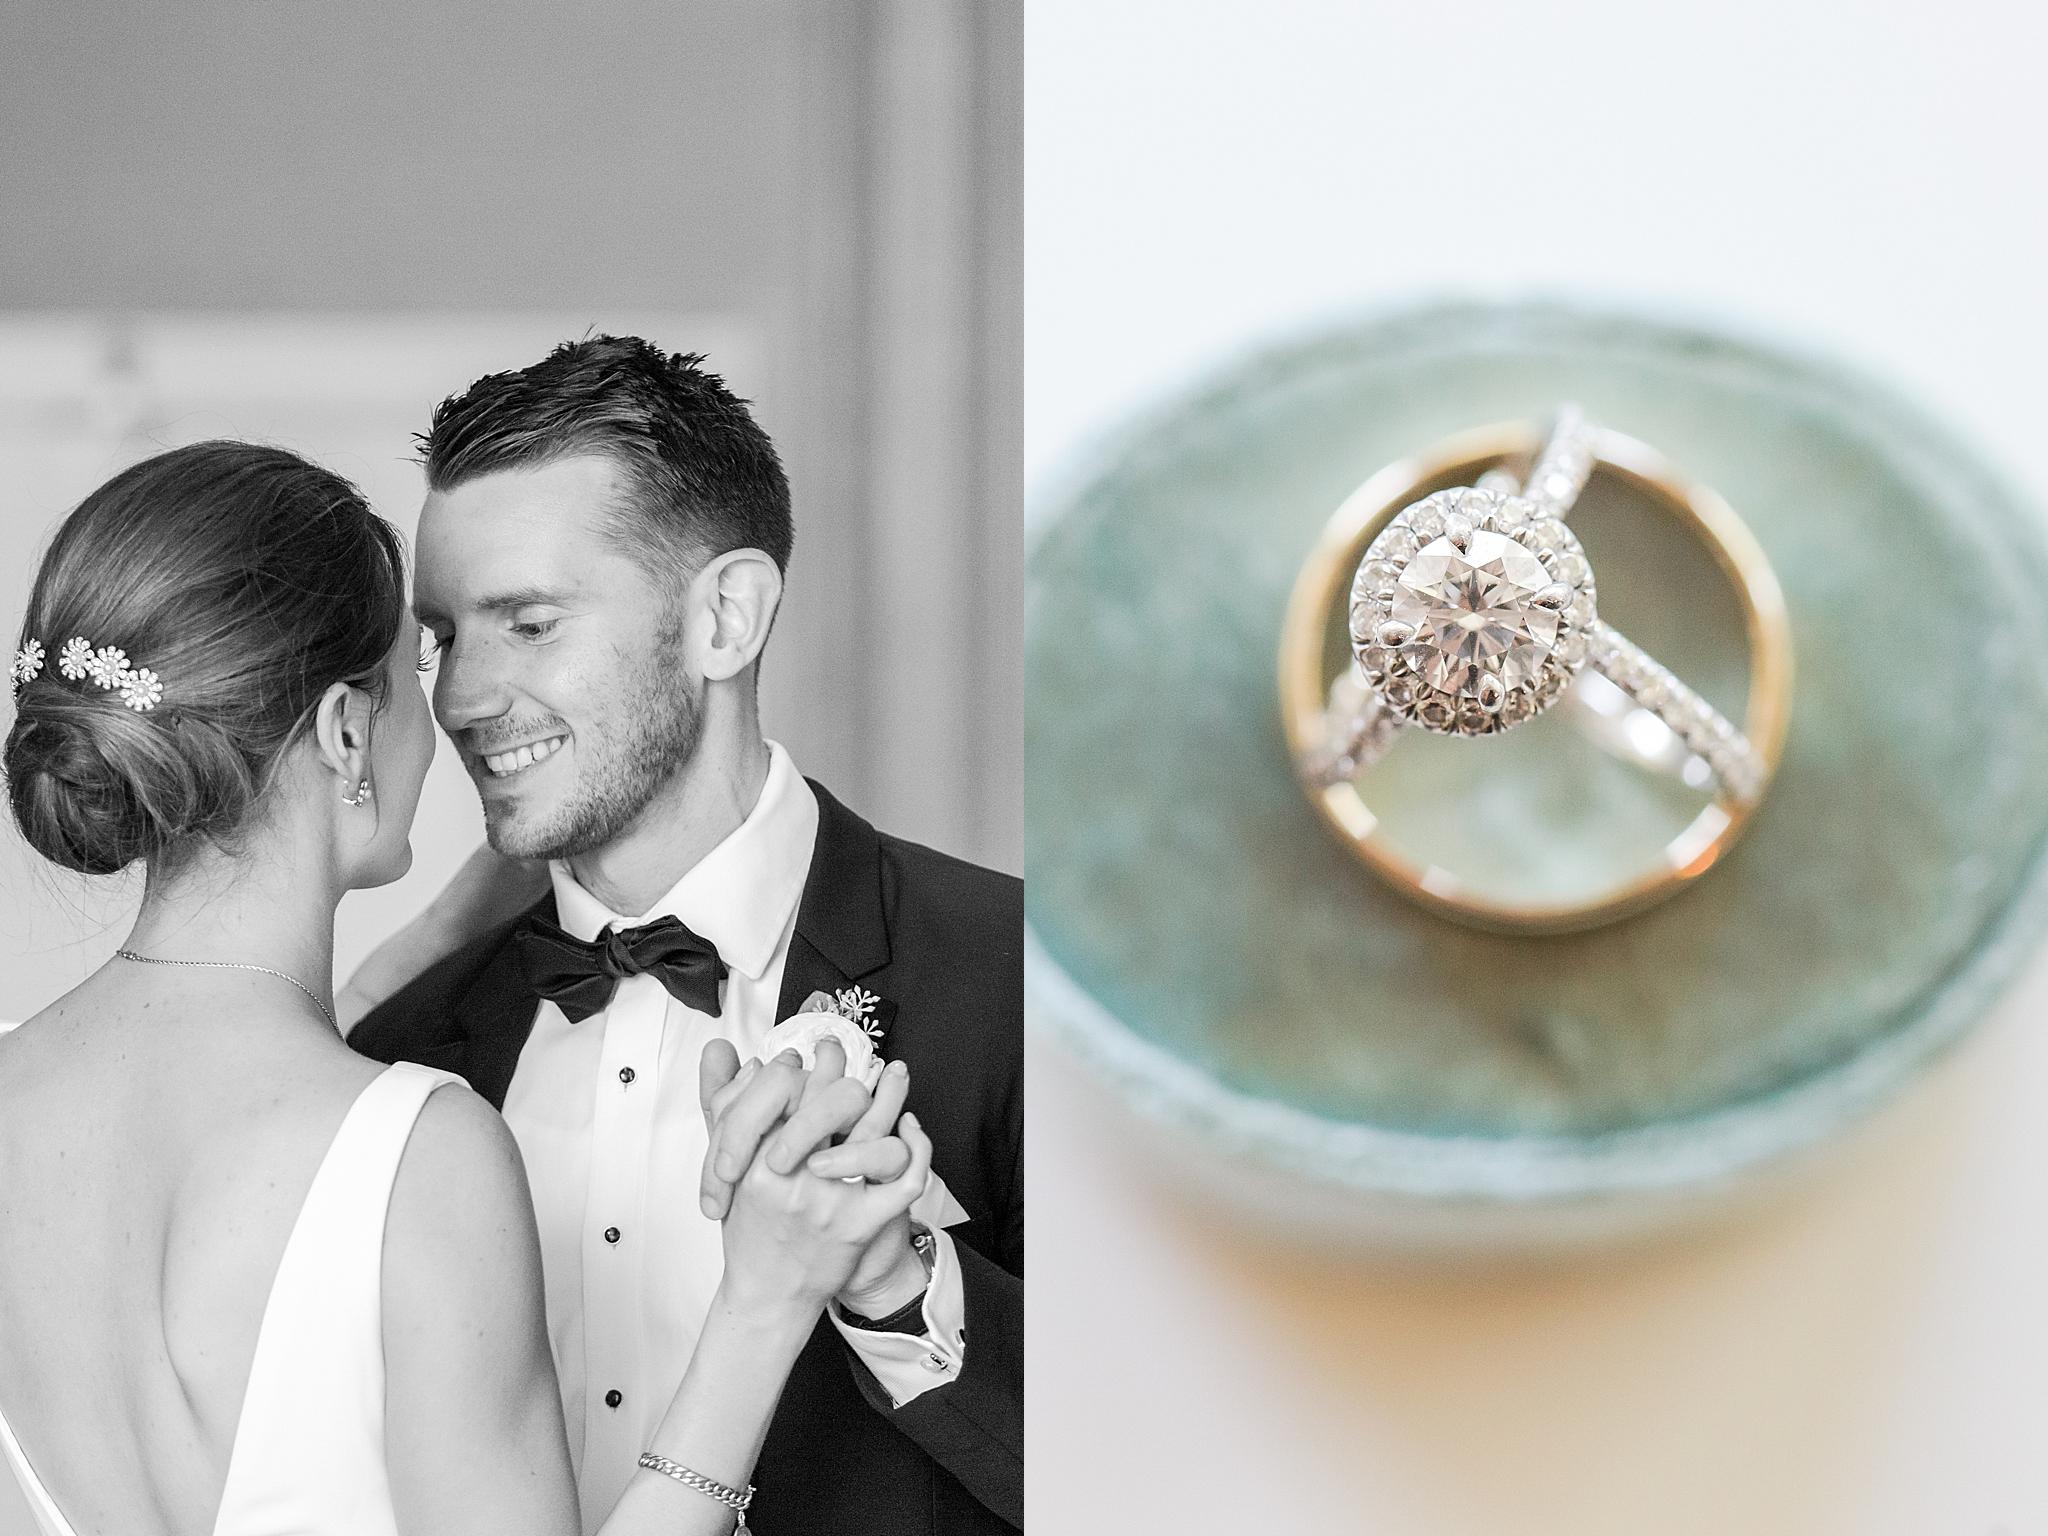 detroit-wedding-photographer-grosse-pointe-academy-chapel-detroit-golf-club-wedding-carly-matt-by-courtney-carolyn-photography_0130.jpg